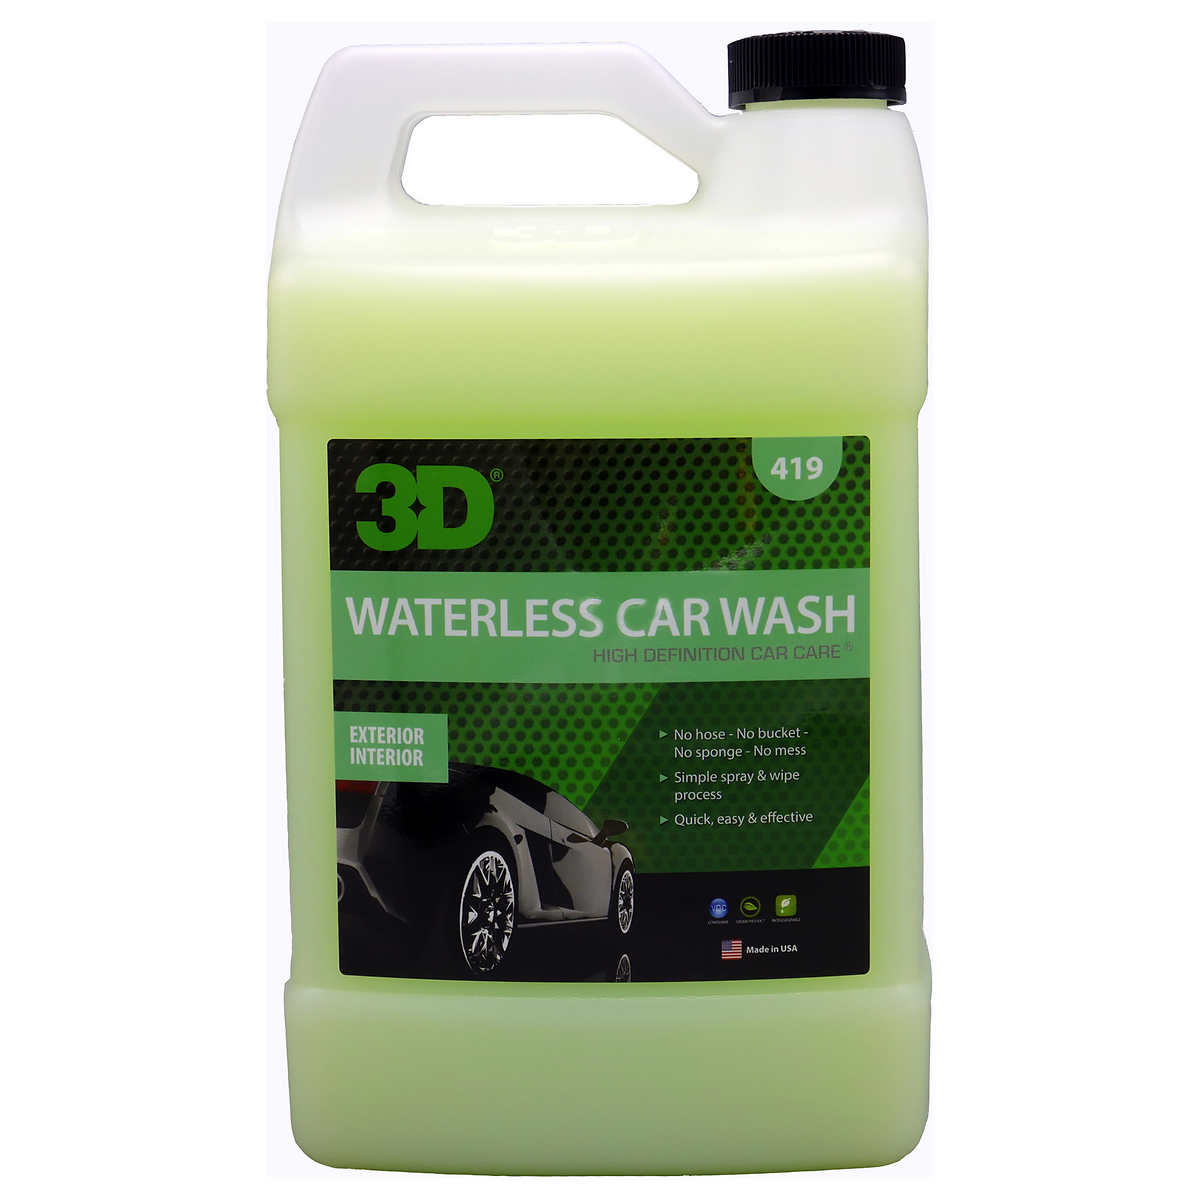 3d waterless car wash 1 gallon refill